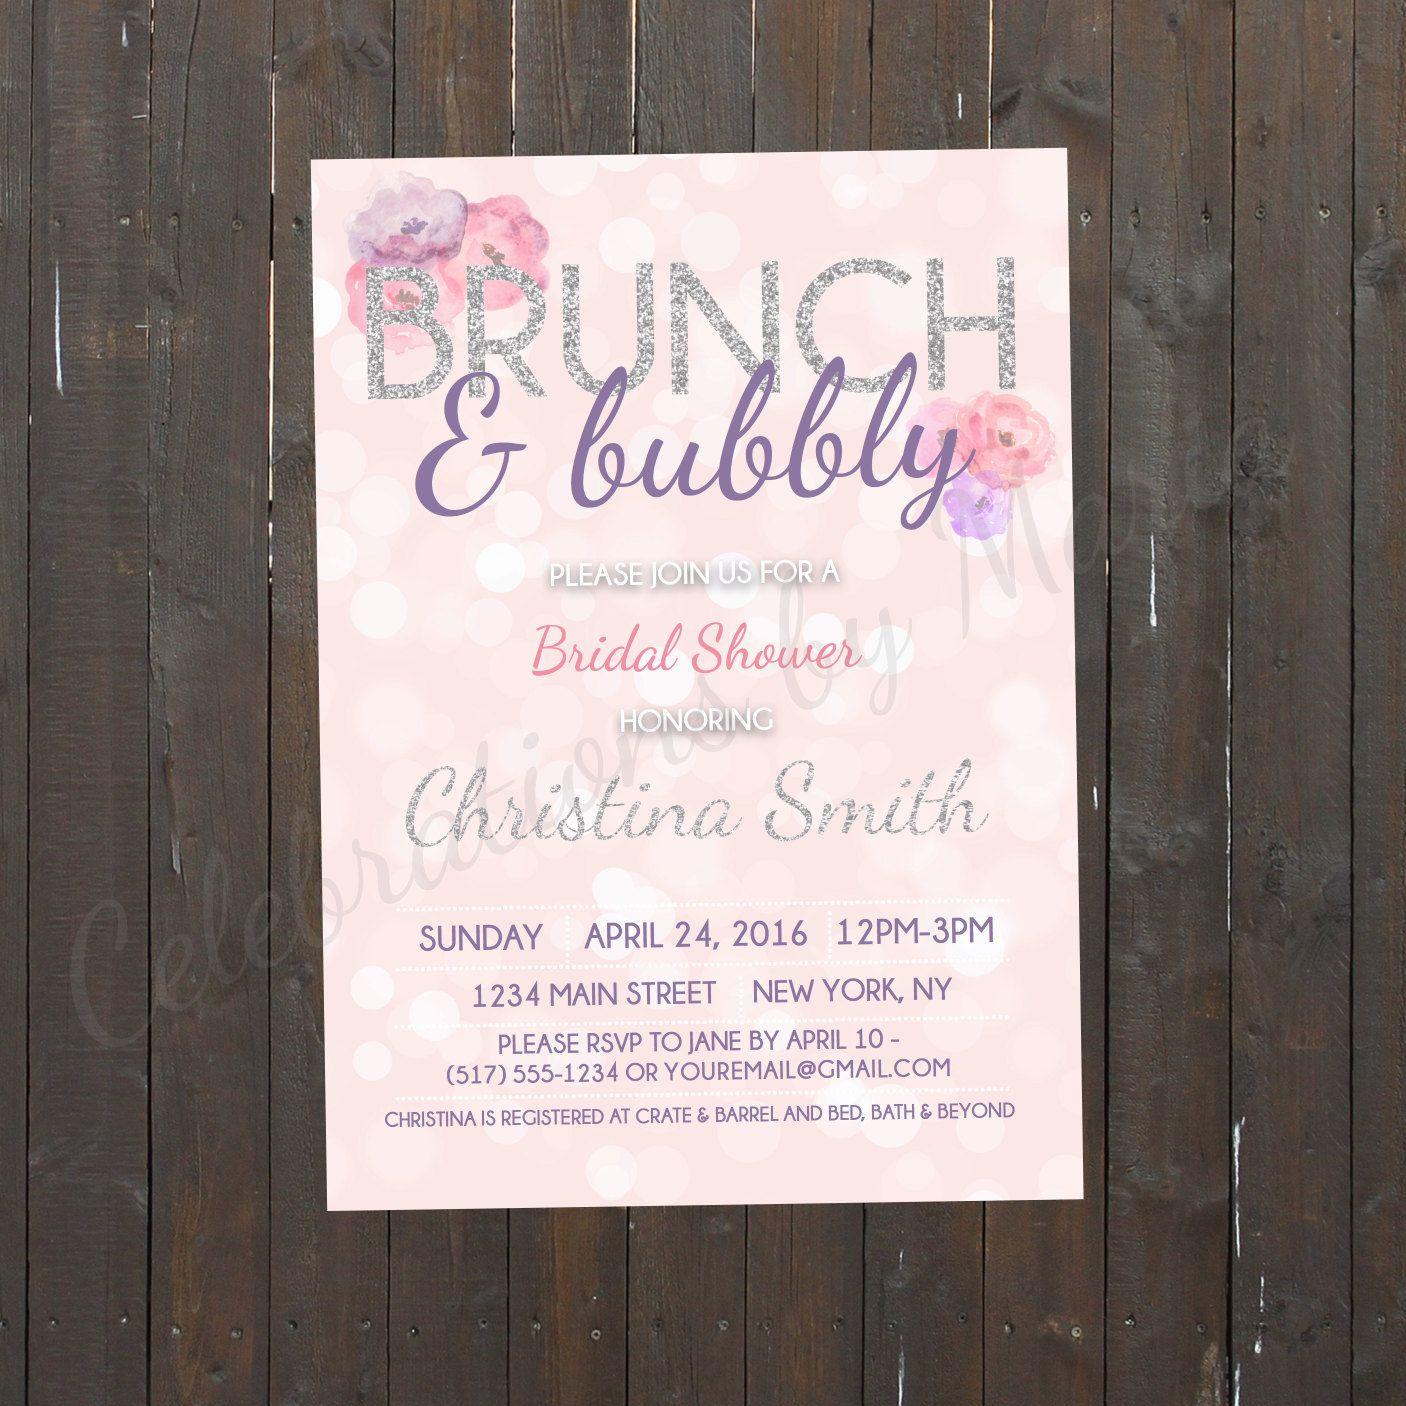 Bokeh Flowers Wedding: Brunch & Bubbly Bridal Shower Invite, Bokeh Background